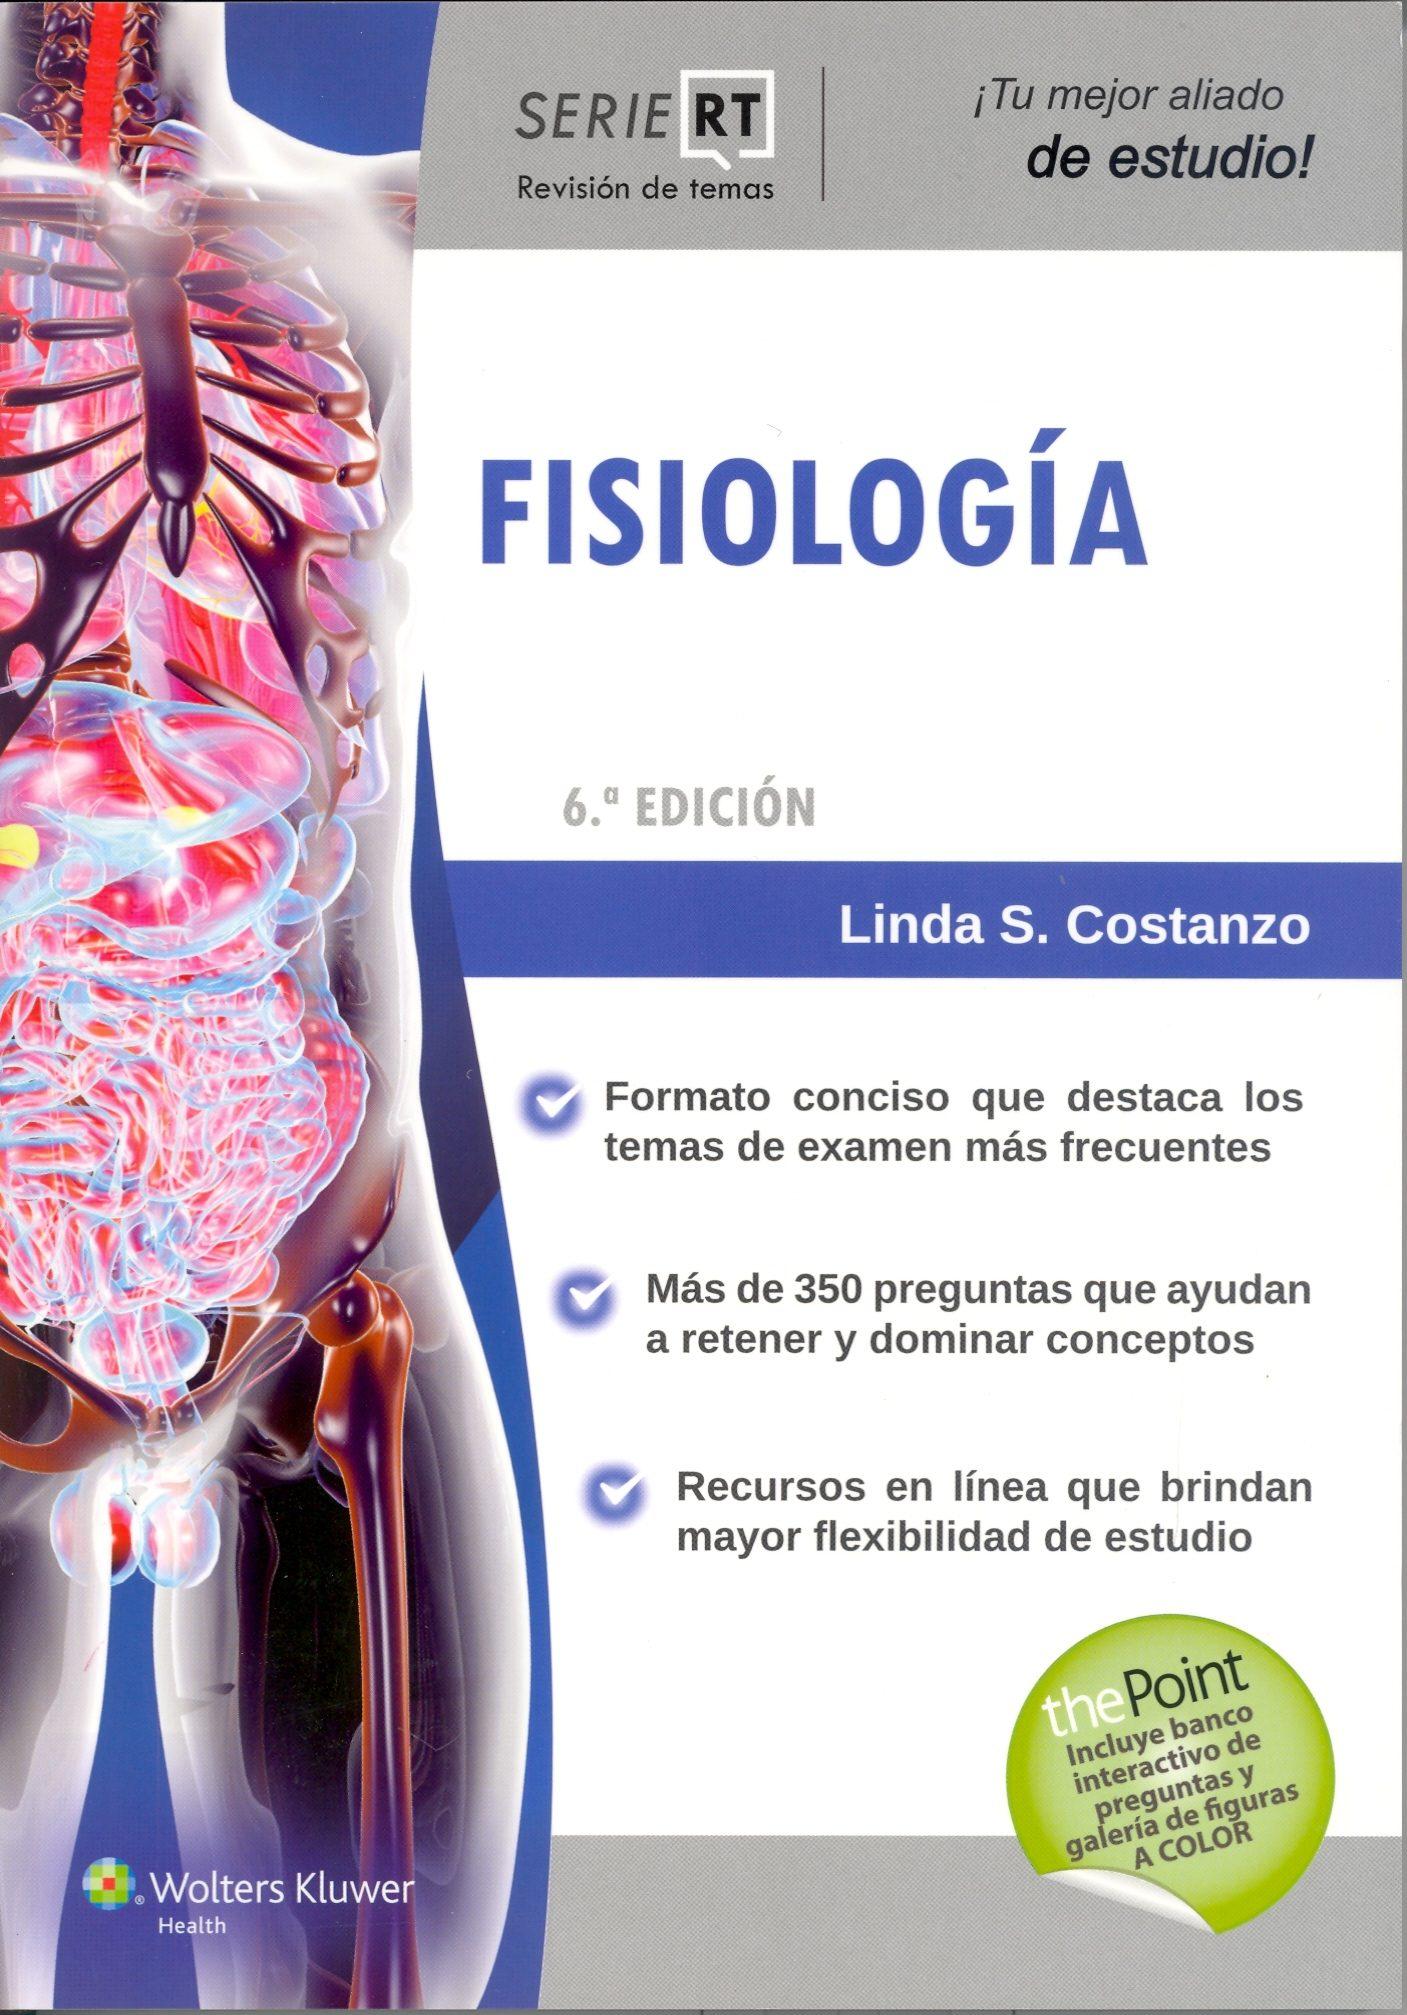 SERIE REVISION DE TEMAS. FISIOLOGIA (6ª ED.) | LINDA S. COSTANZO ...